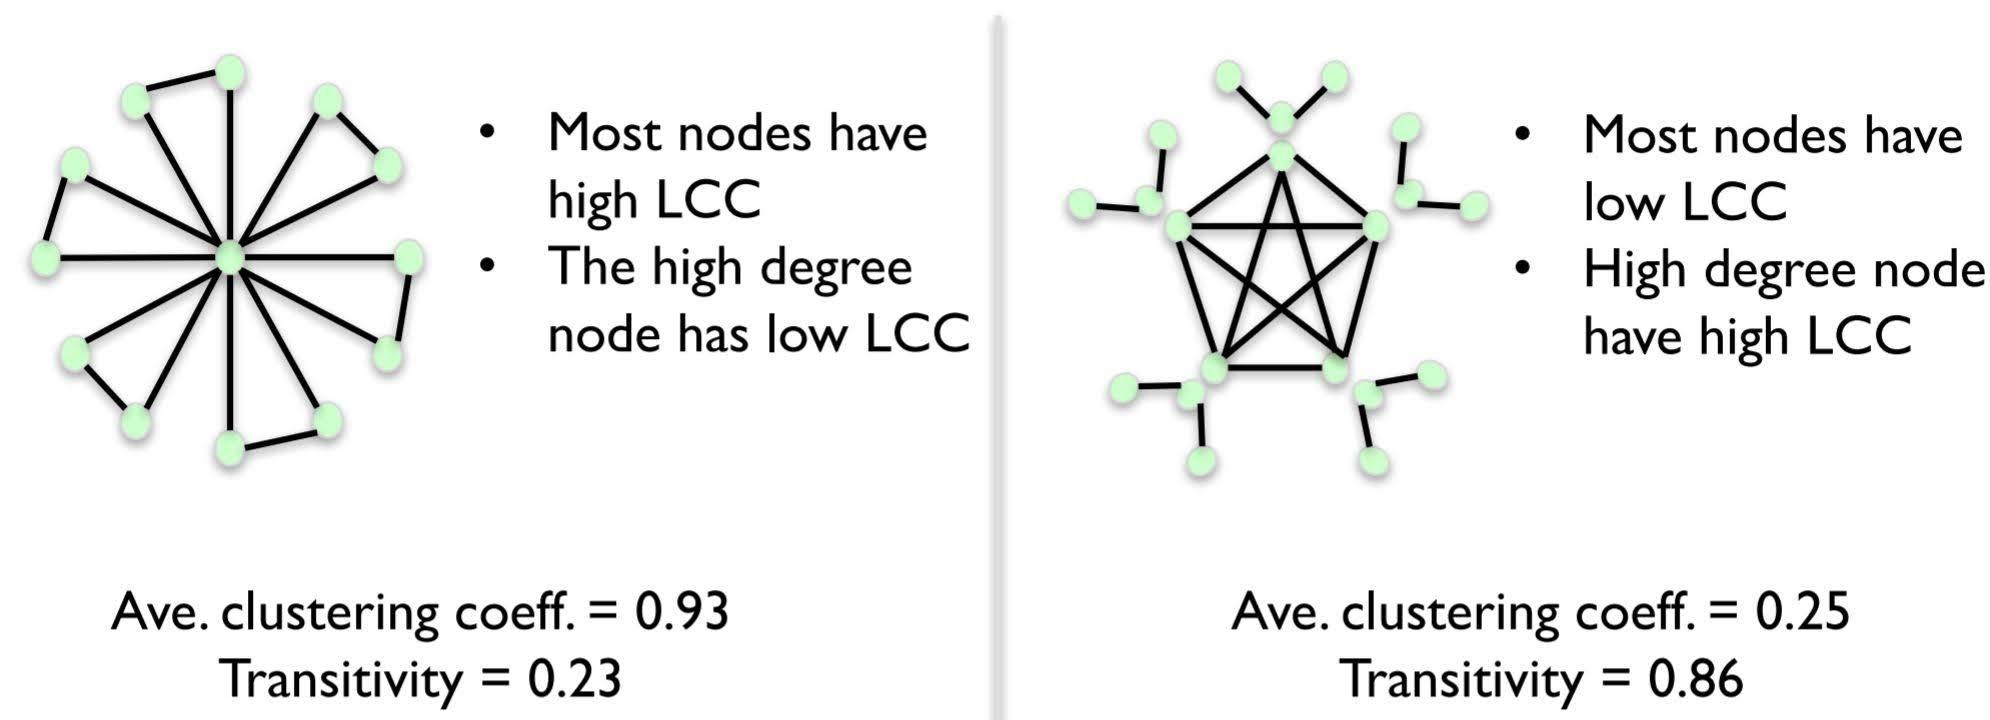 transitivity vs average clustering coefficient